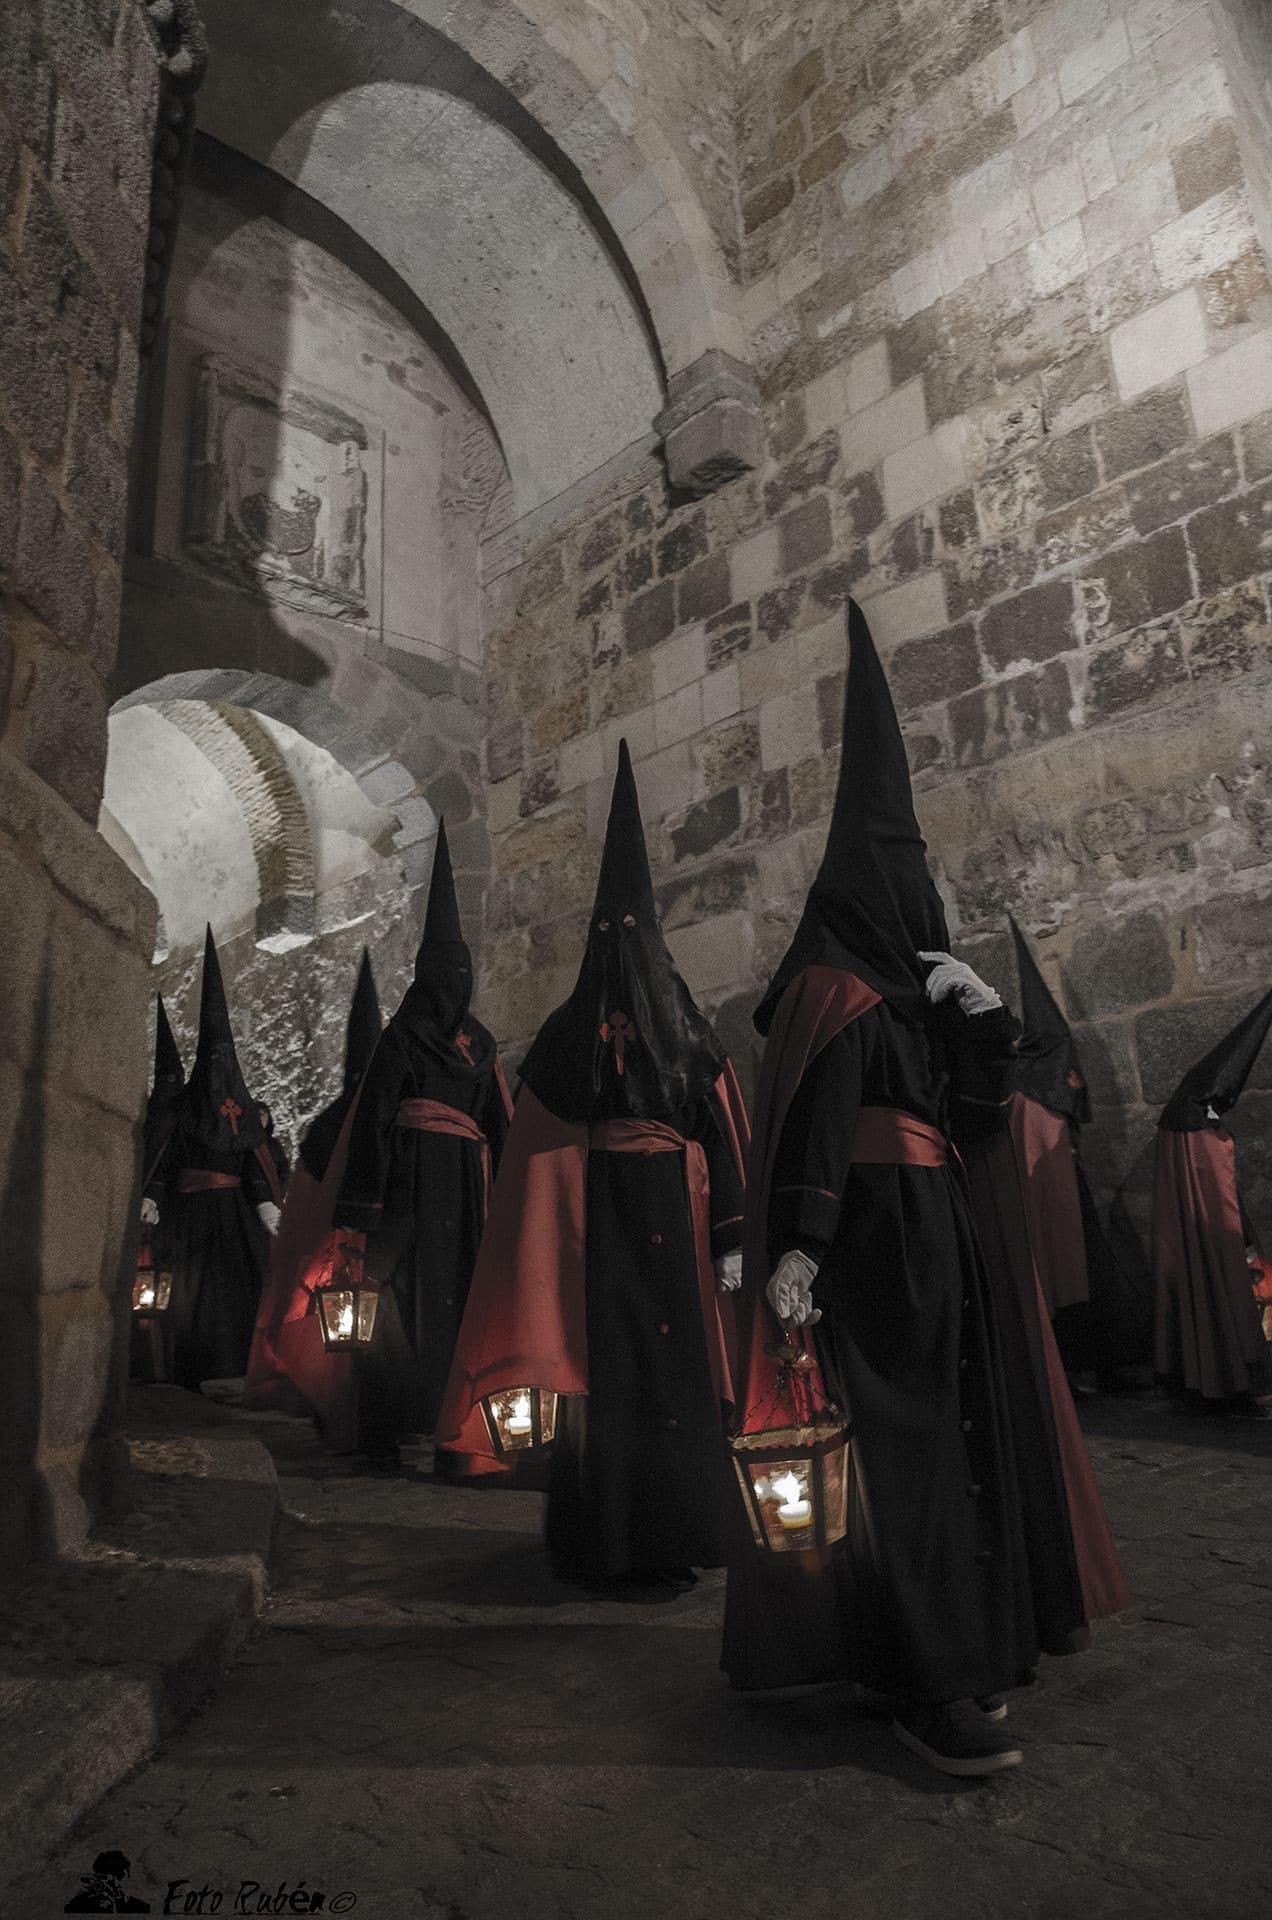 Procesion de Ntra. Madre Marçia Santismima de las Angustias, Segovia4